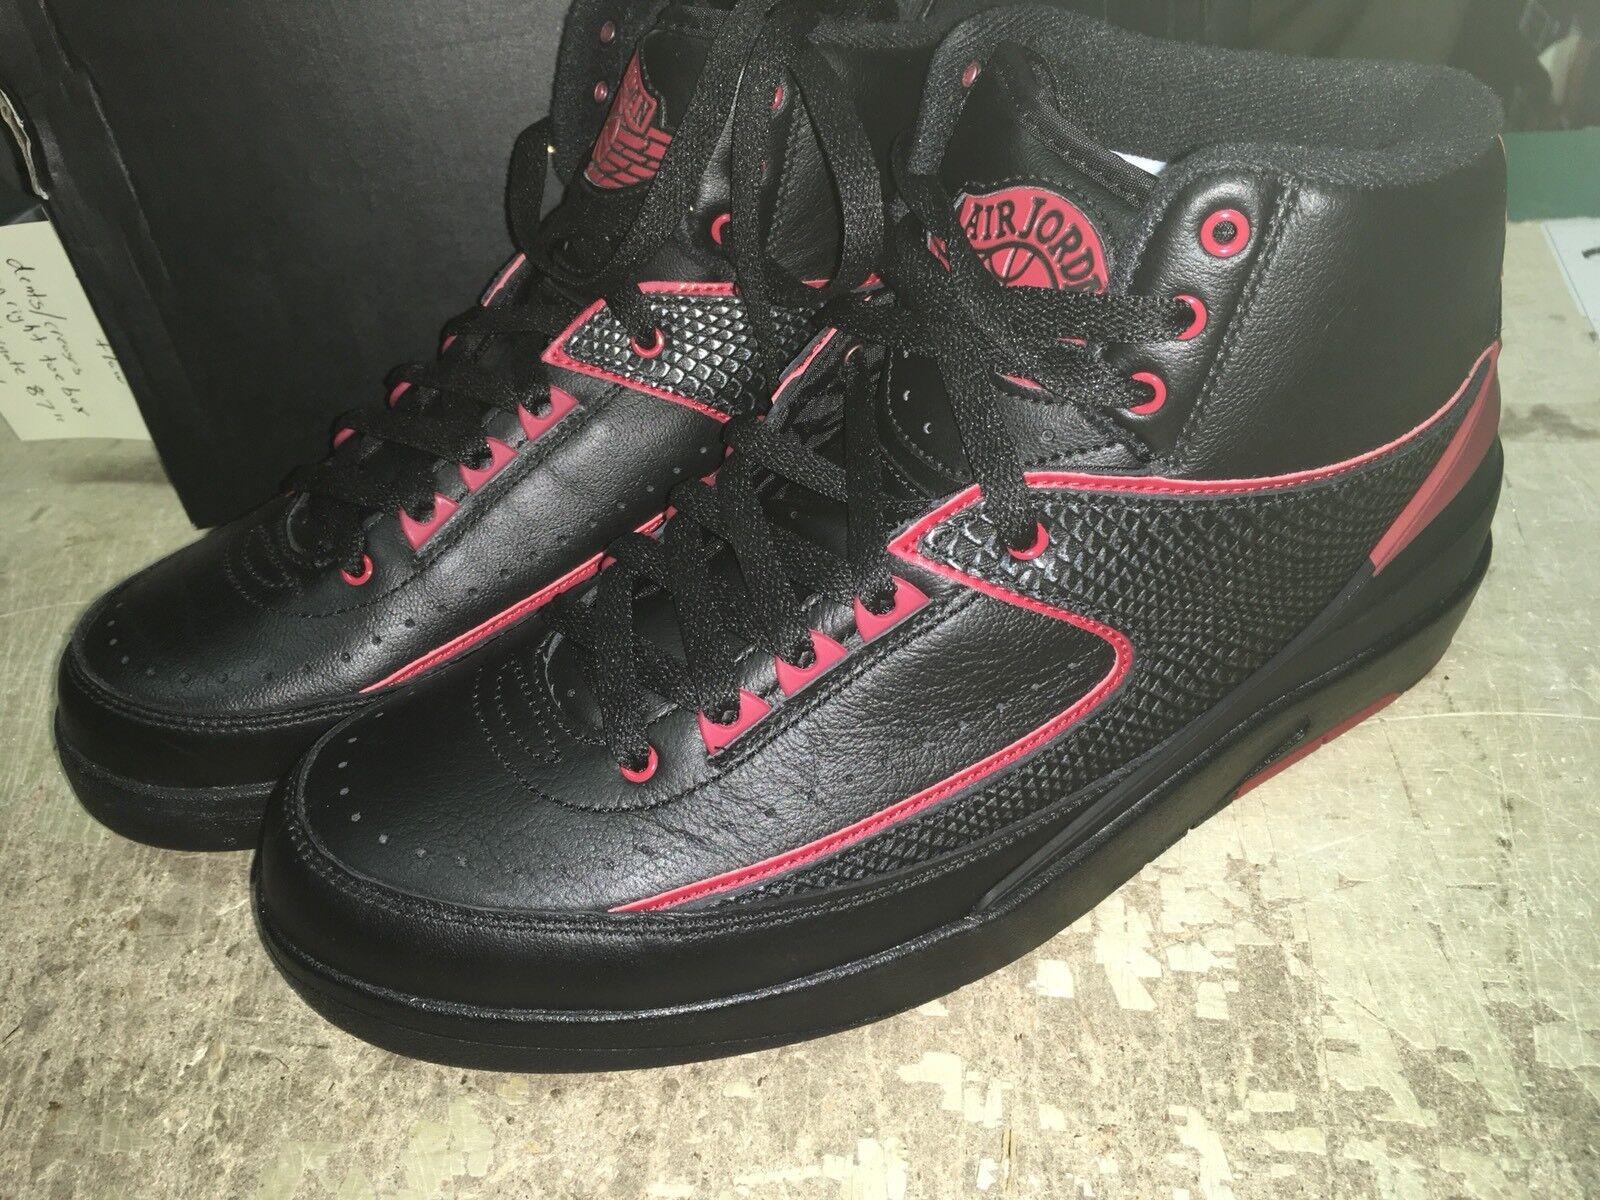 NEW MENS NIKE AIR JORDAN II 2 RETRO ALTERNATE 87 832274 001 FLAW Price reduction Wild casual shoes Great discount